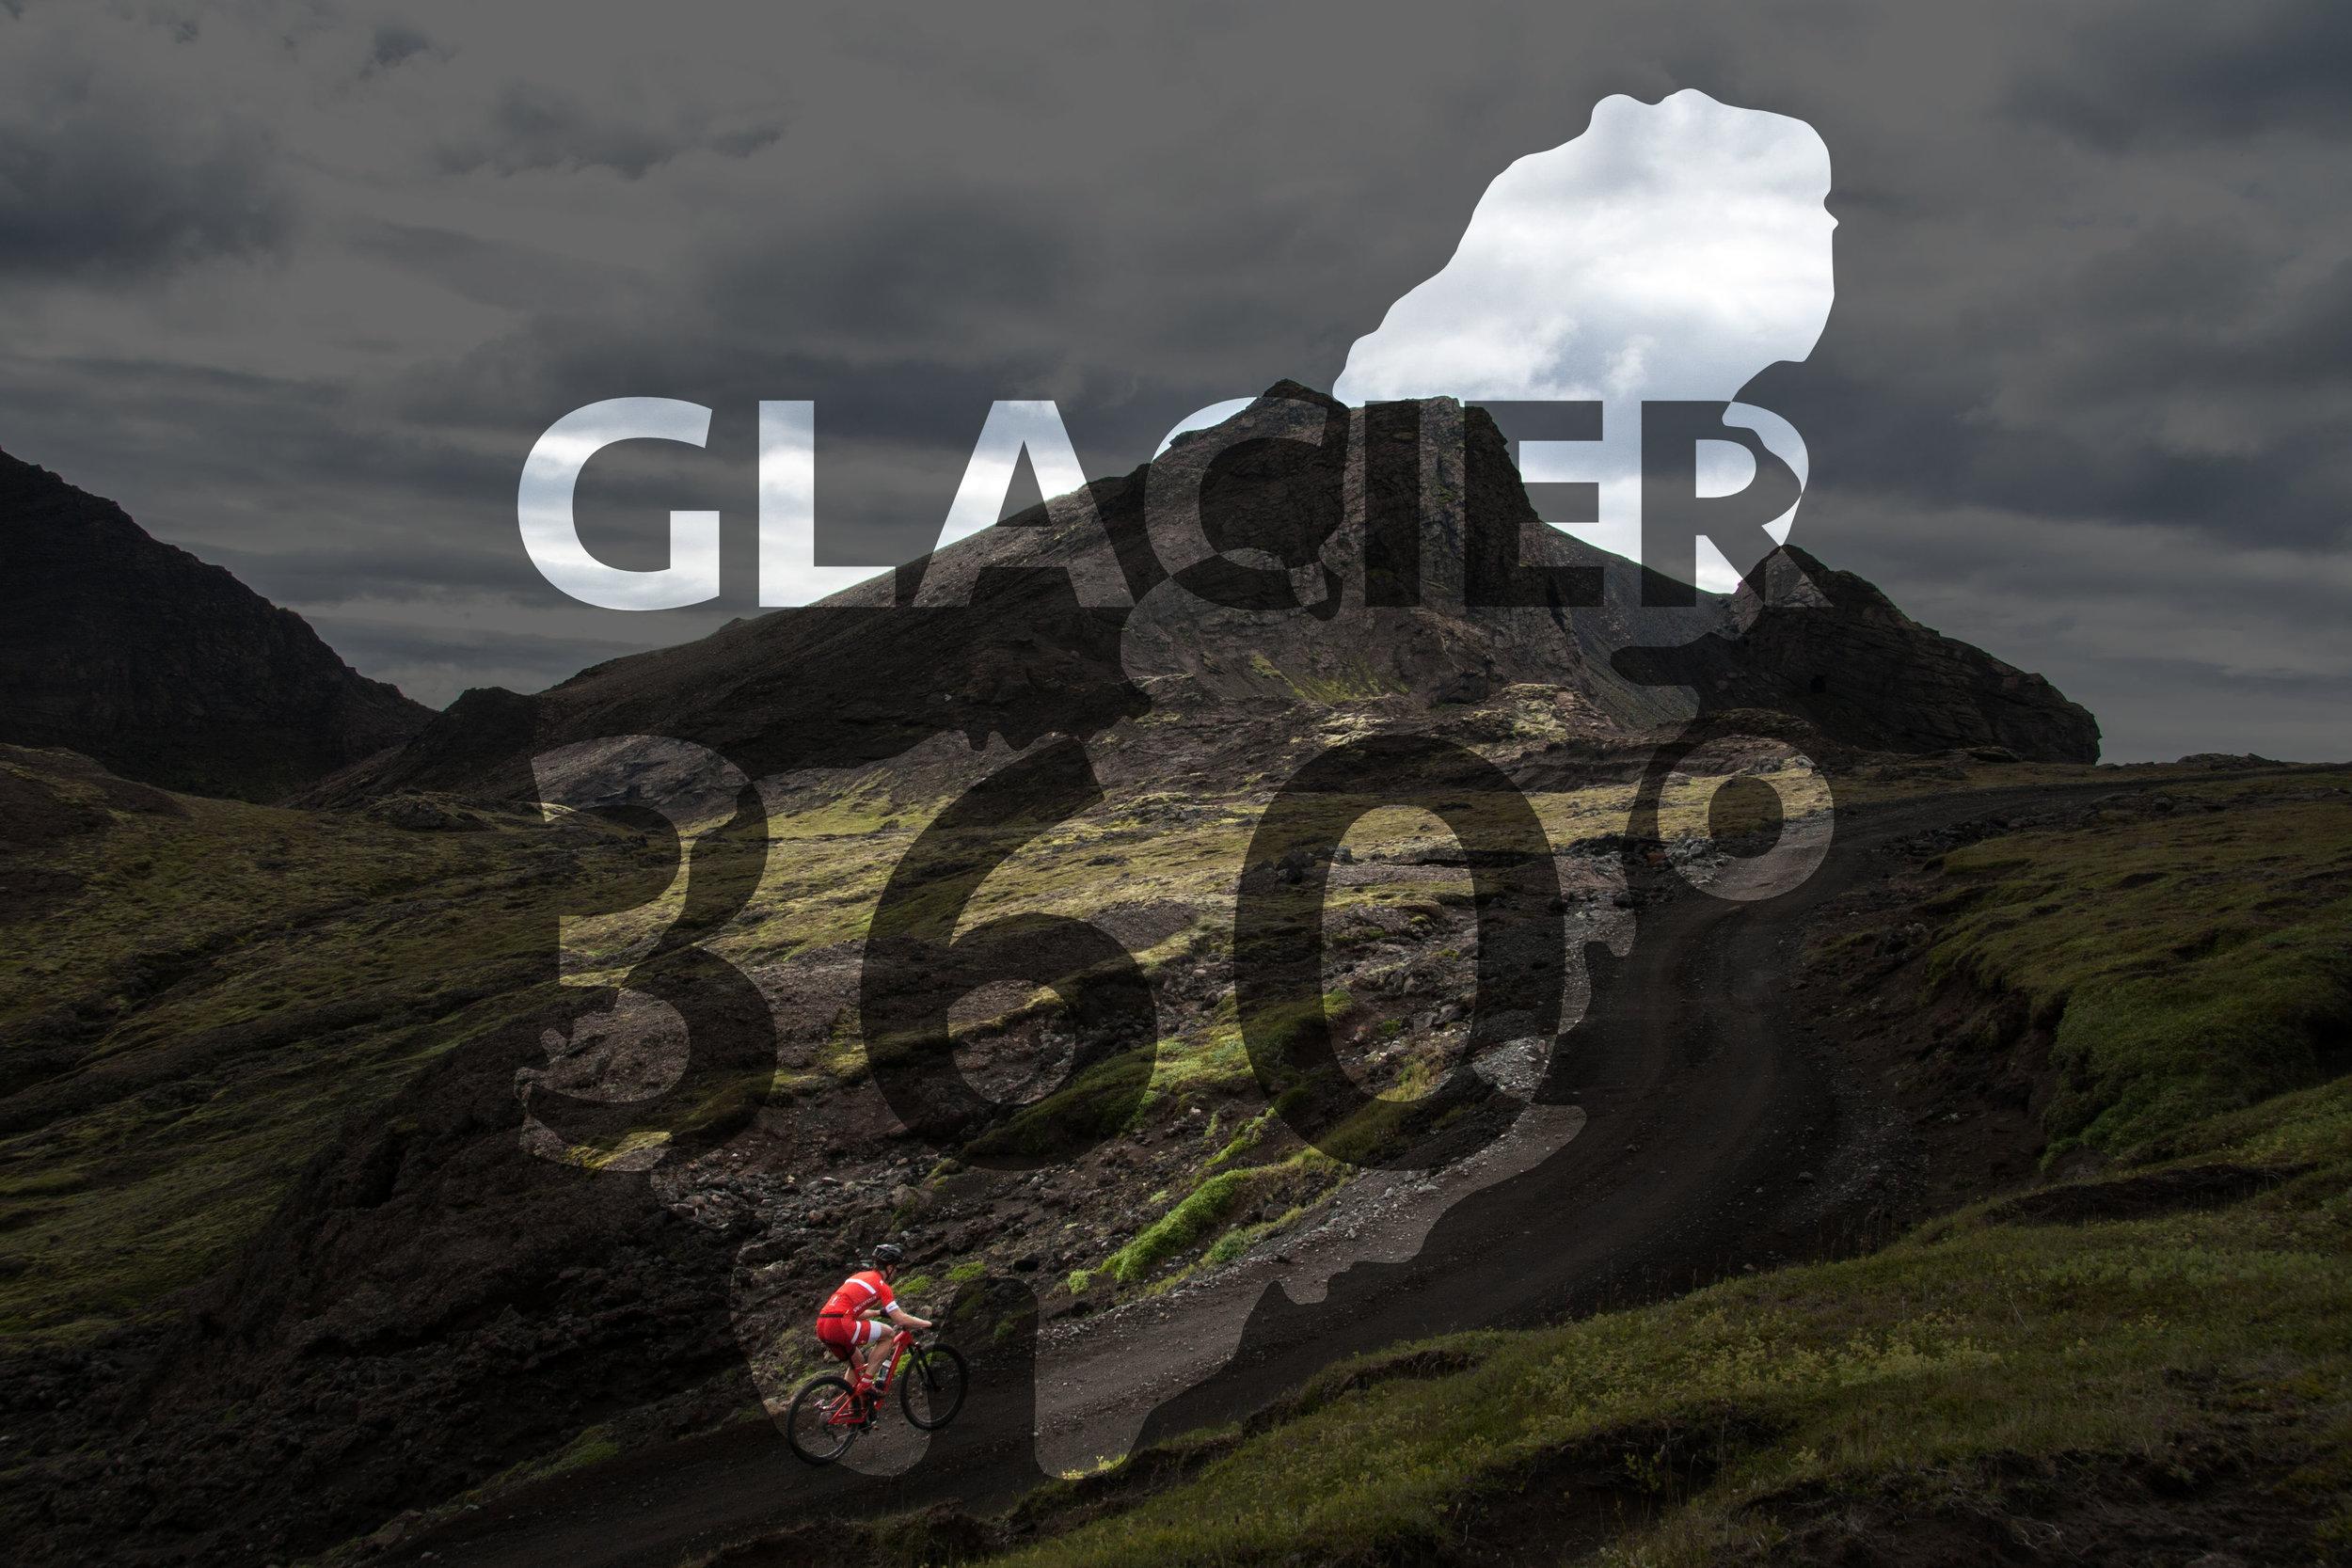 Glacier 360 logo overlay IMG_0755.jpg